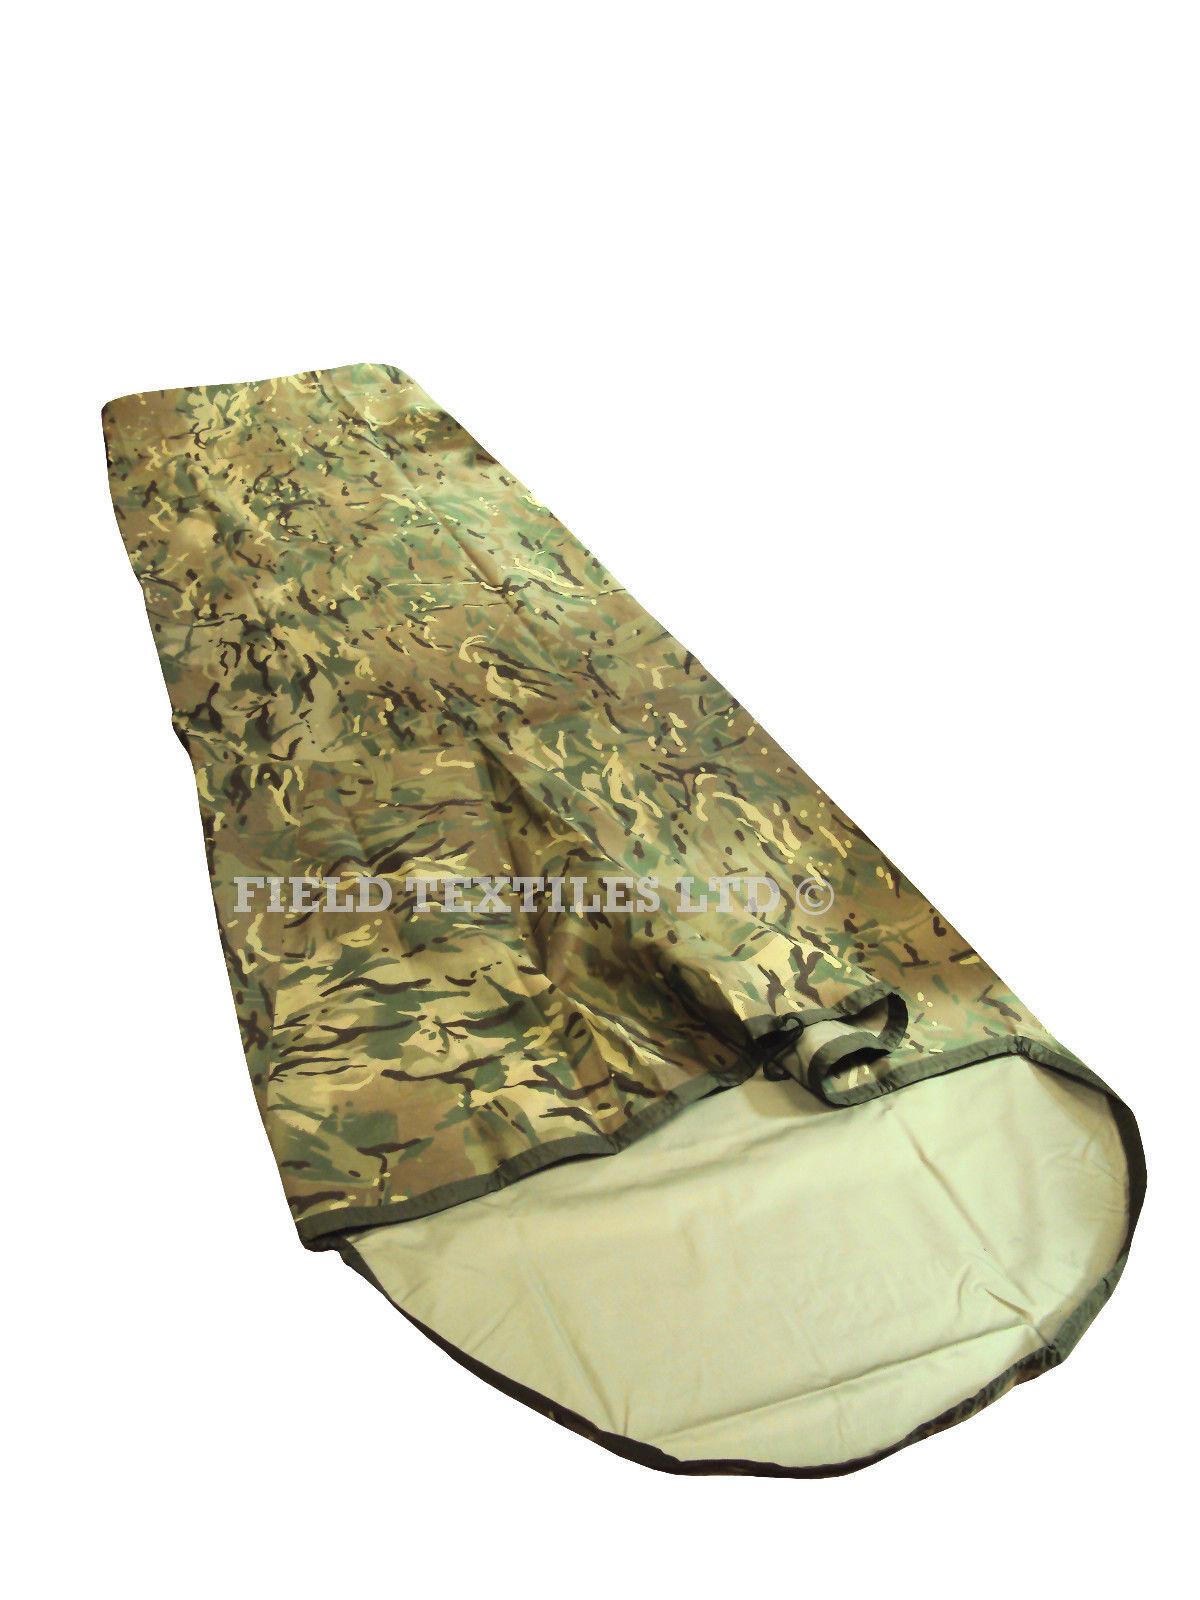 SLEEPING BAG COVER - MTP BIVI BAG  Goretex Waterproof - British Army - Grade 1  we offer various famous brand